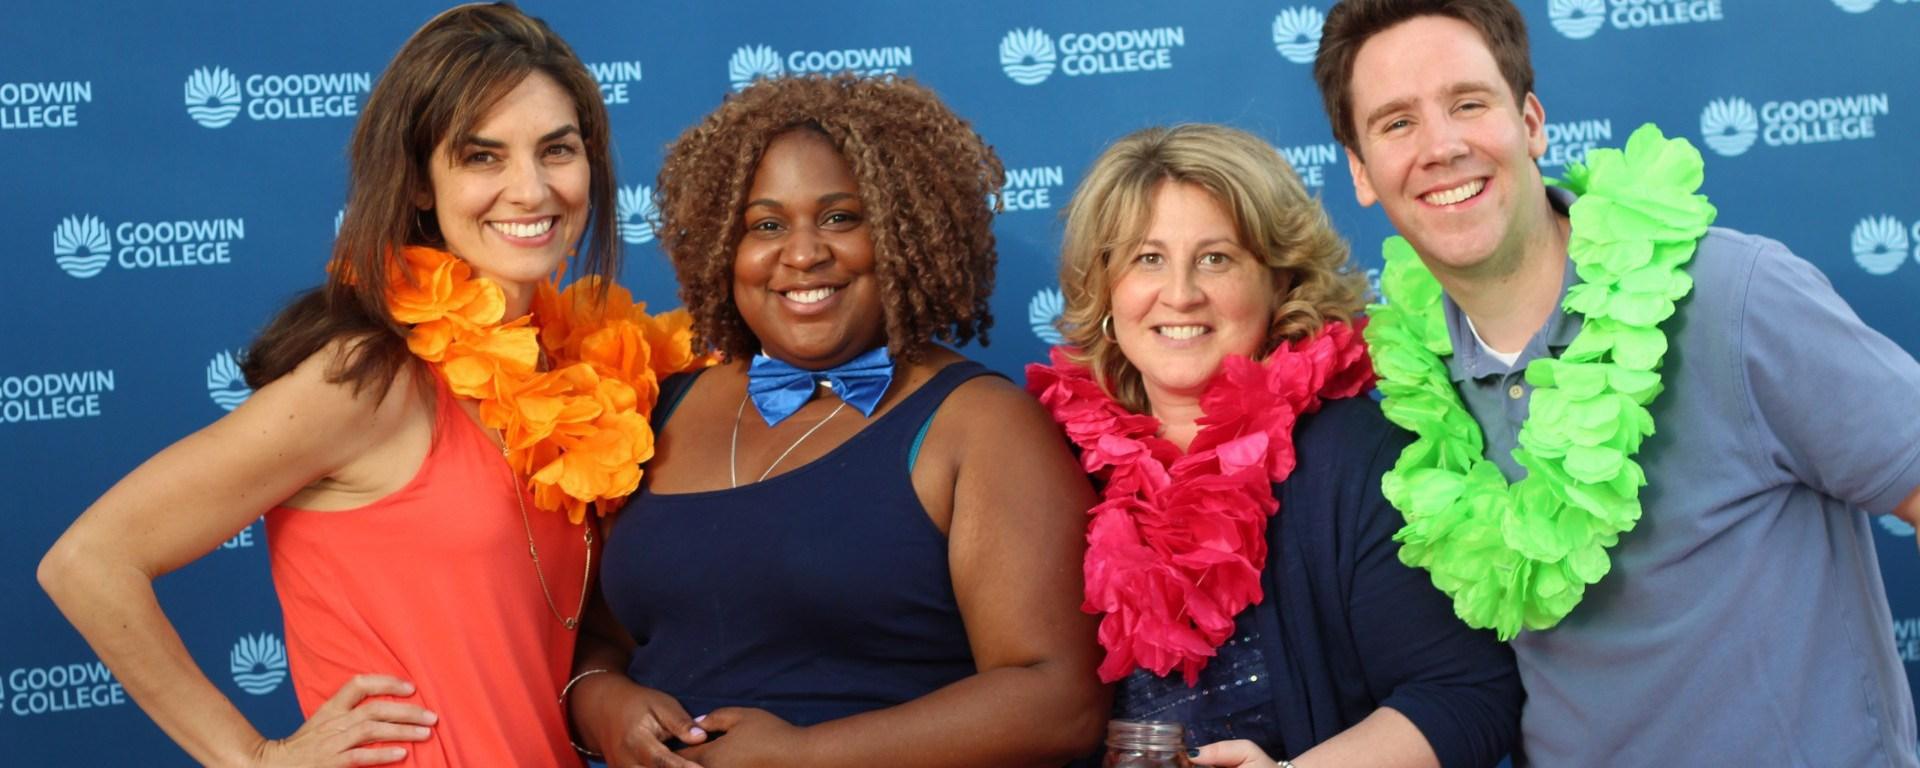 2015 Goodwin College Clambake